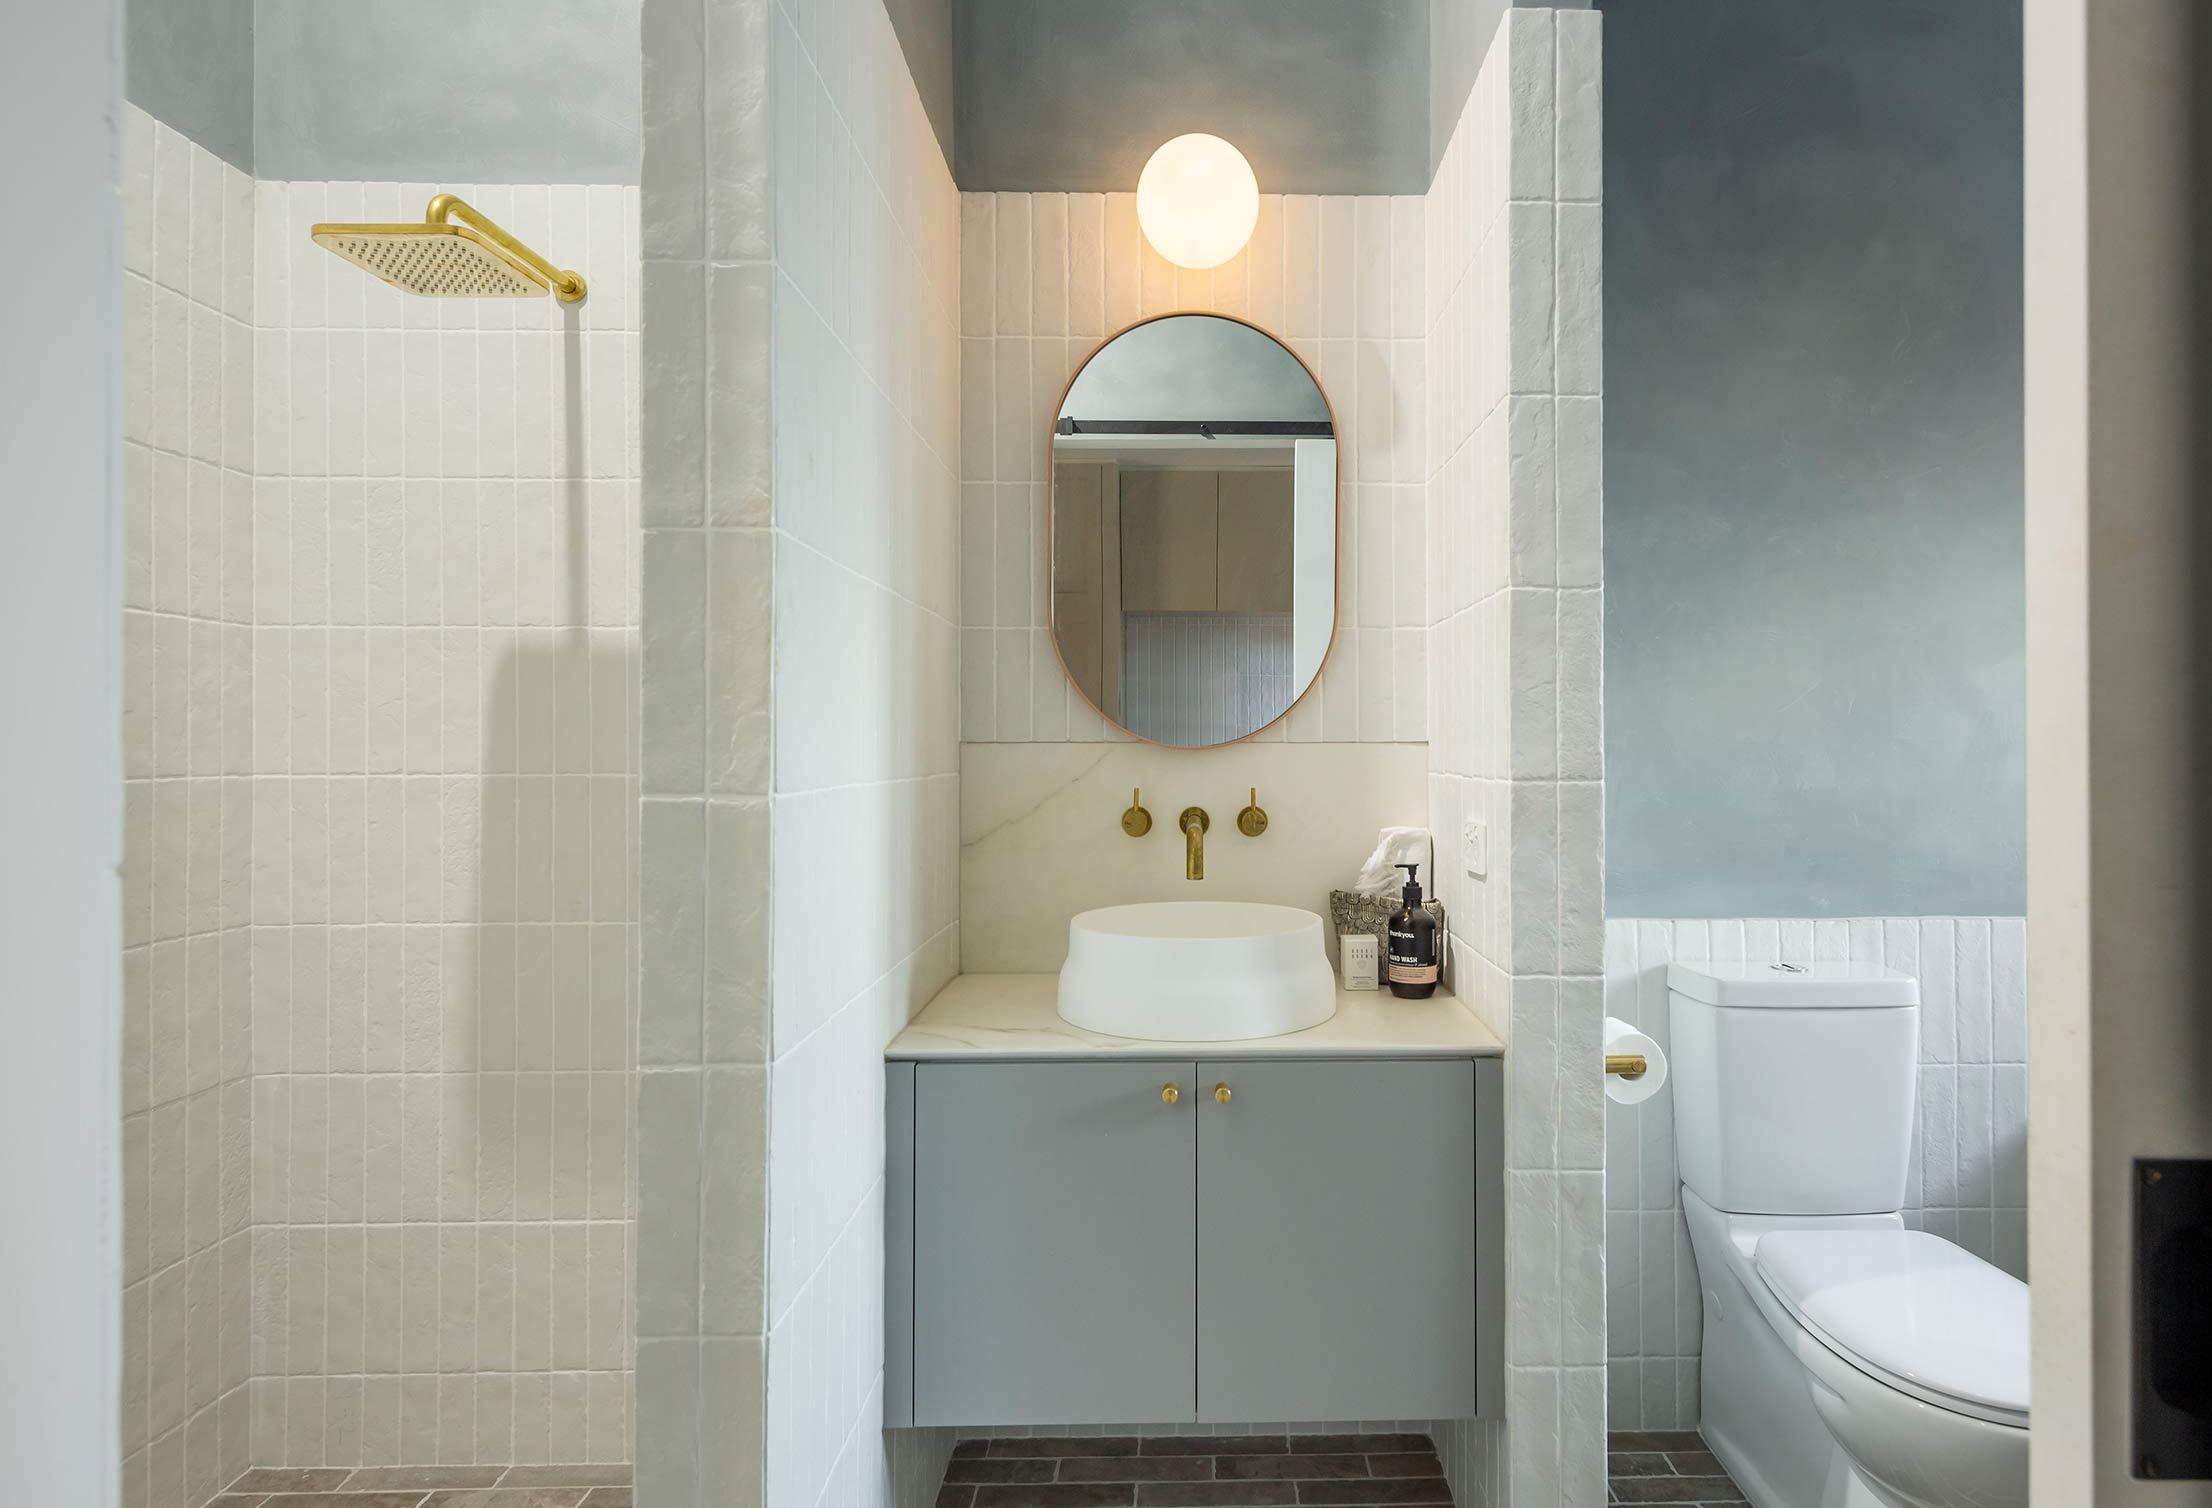 turnbull-built-renovation-bathroom-custom-goodwood-sa.jpg